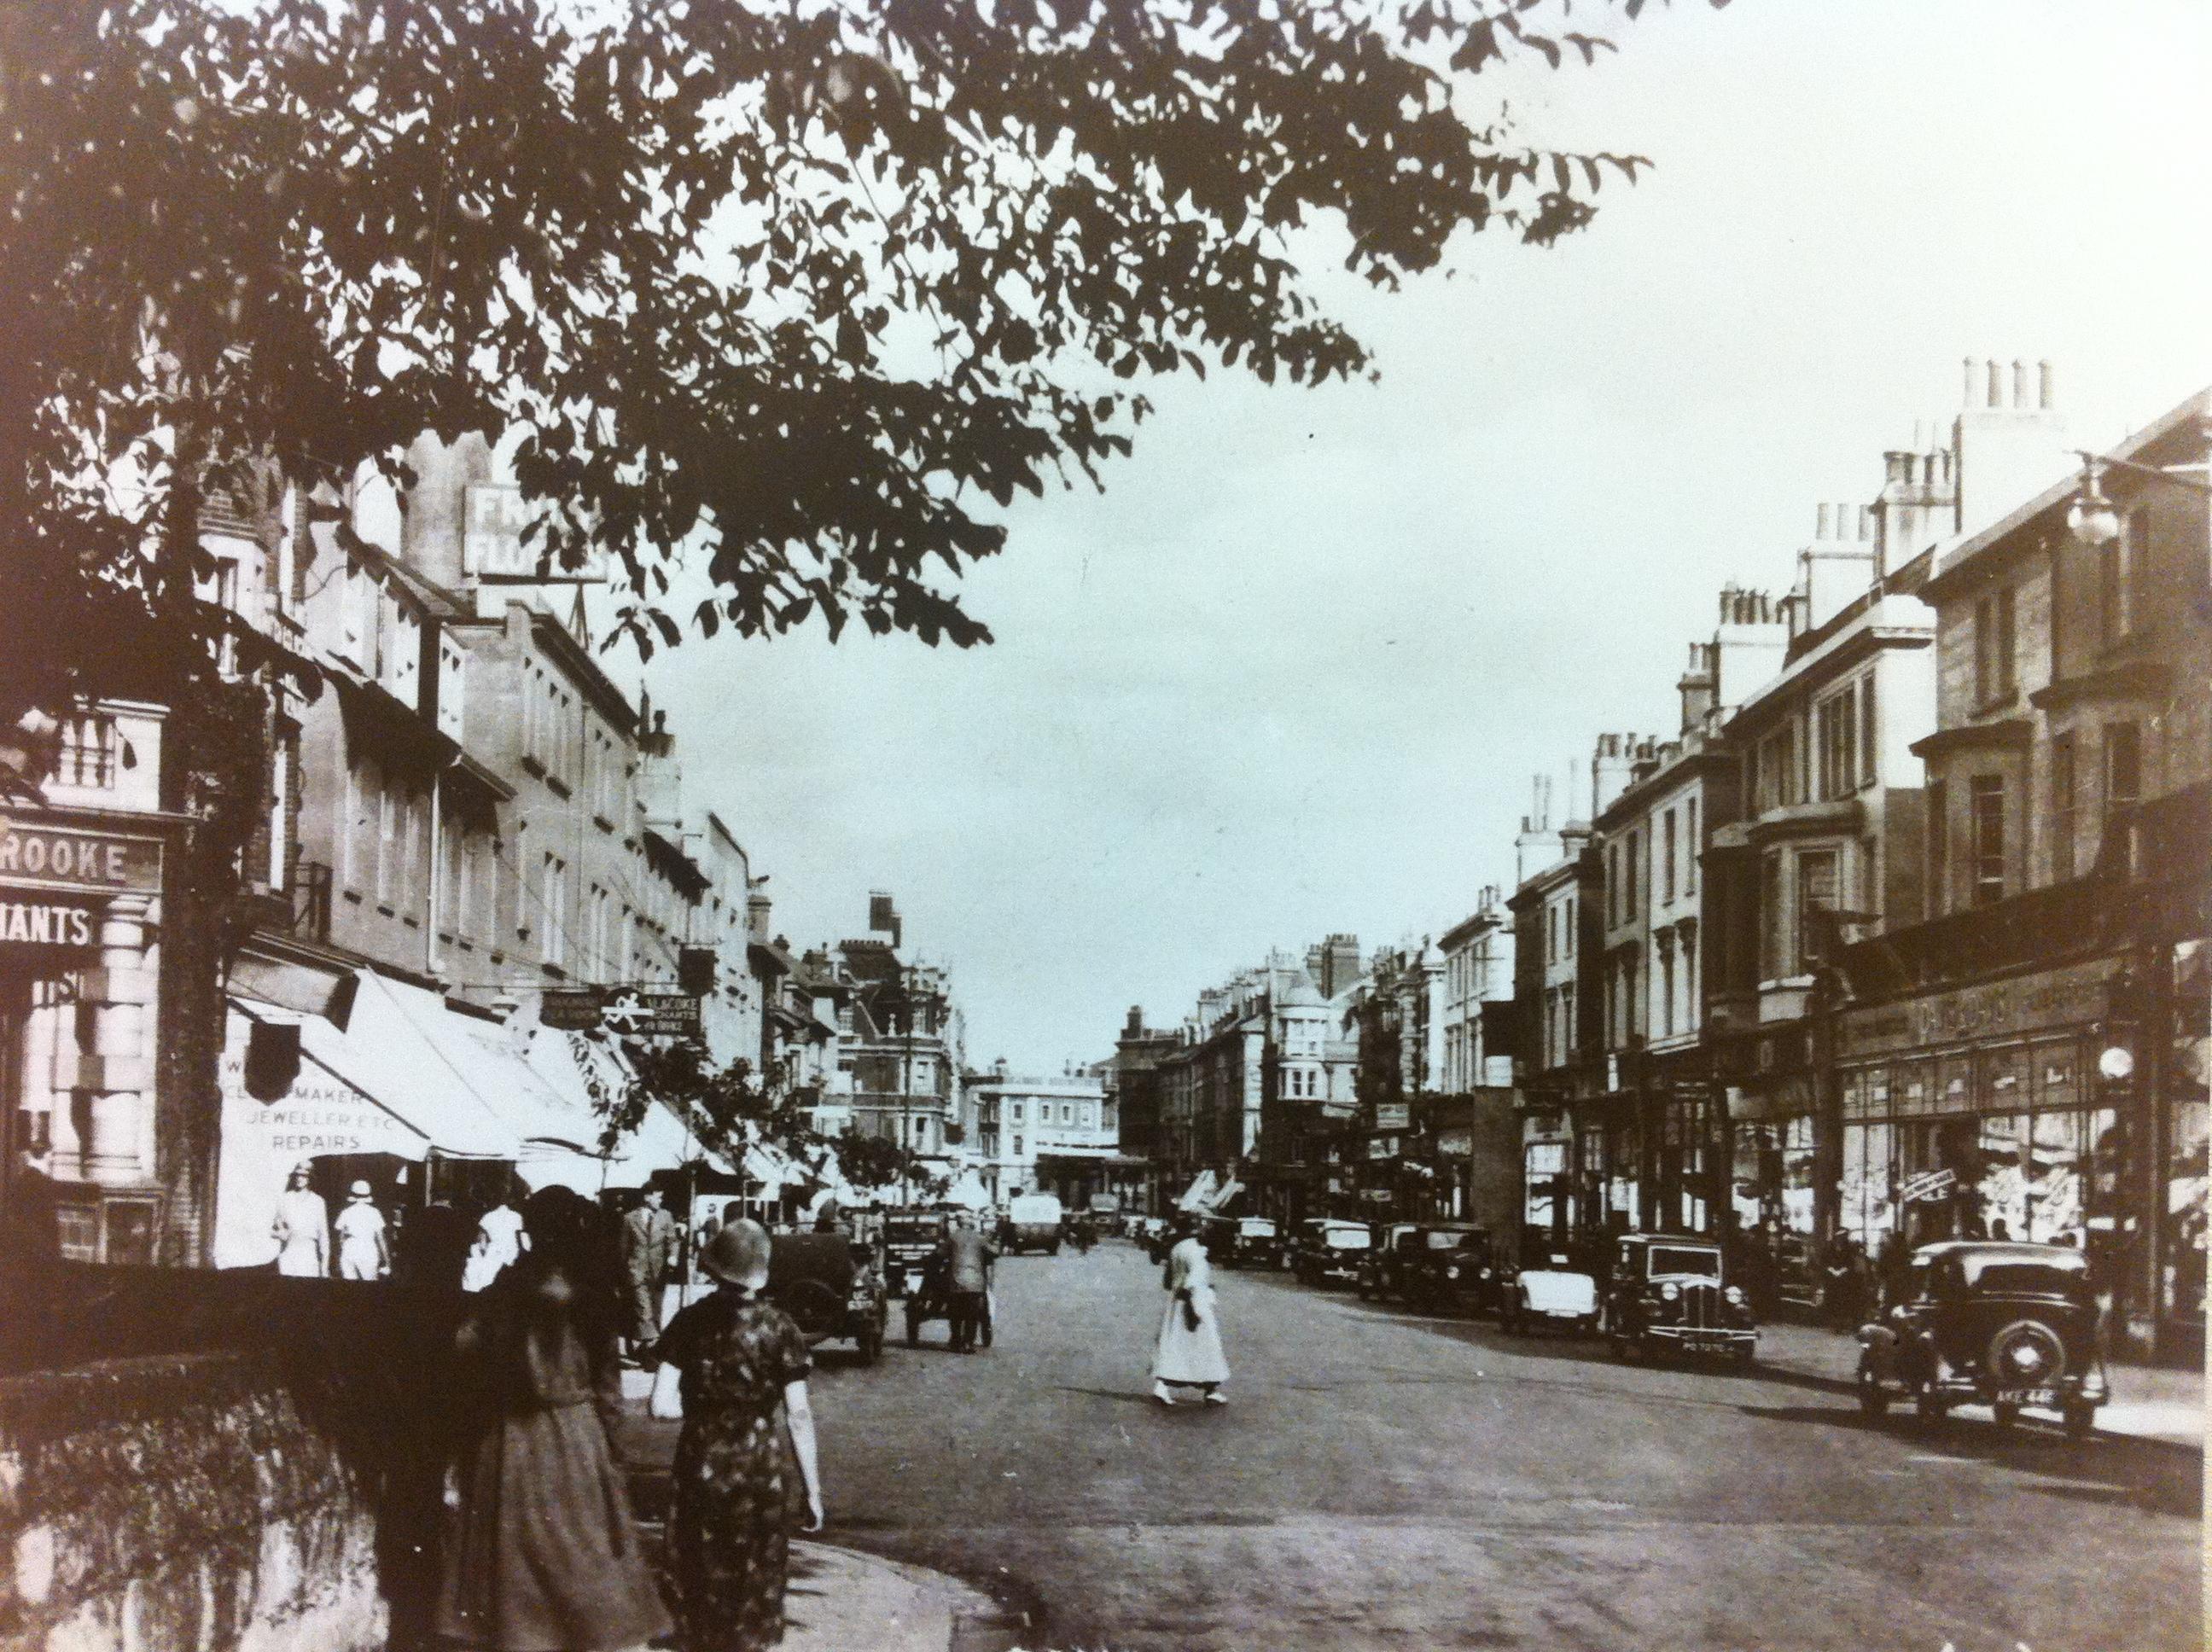 Sandgate Road, Folkestone, circa 1900.